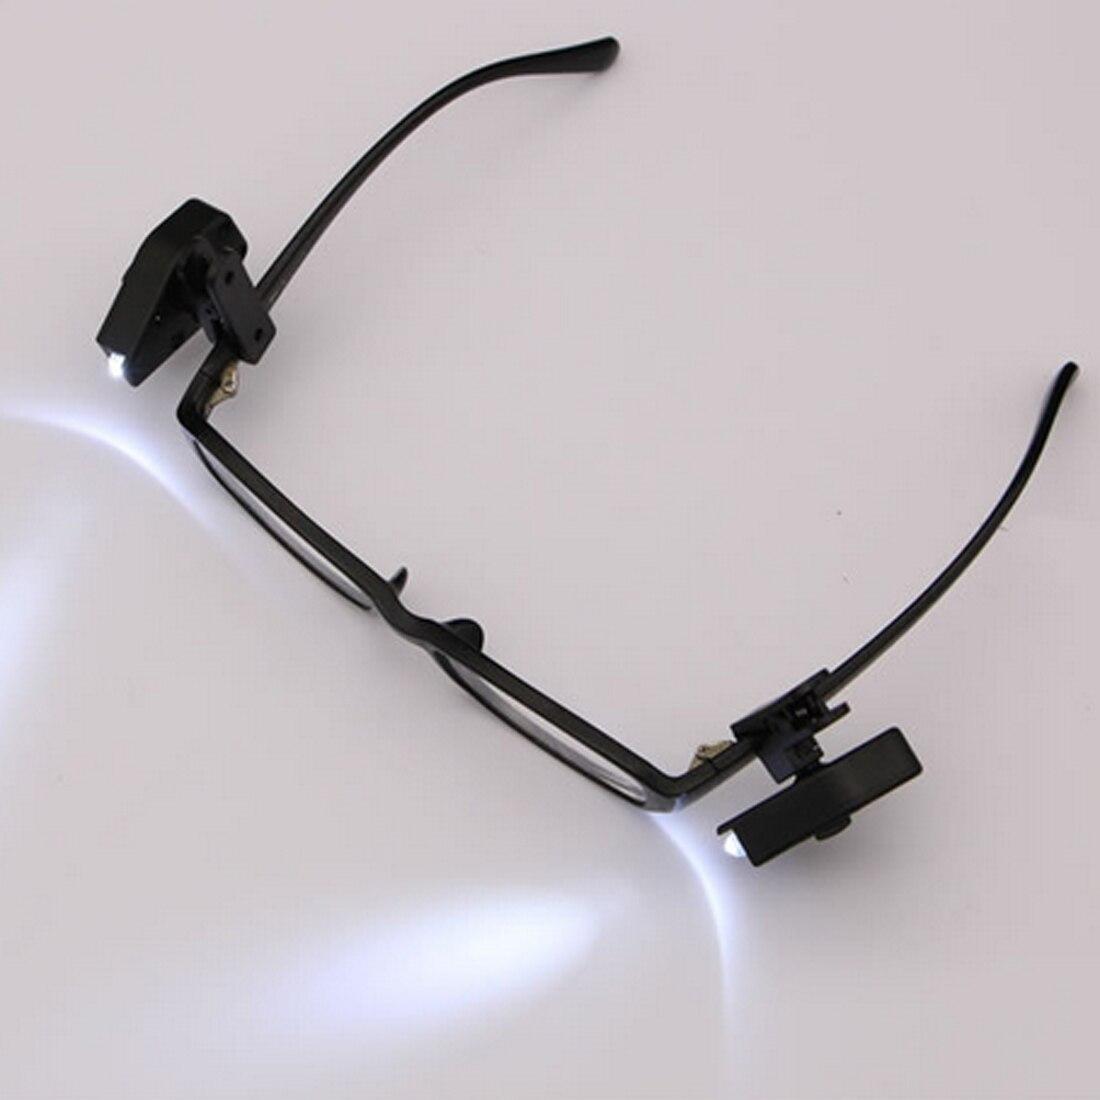 2pcs Flexible Book Reading Lights Night Light For Eyeglass And Tools Mini LED Eyeglass Clip On Universal Portable